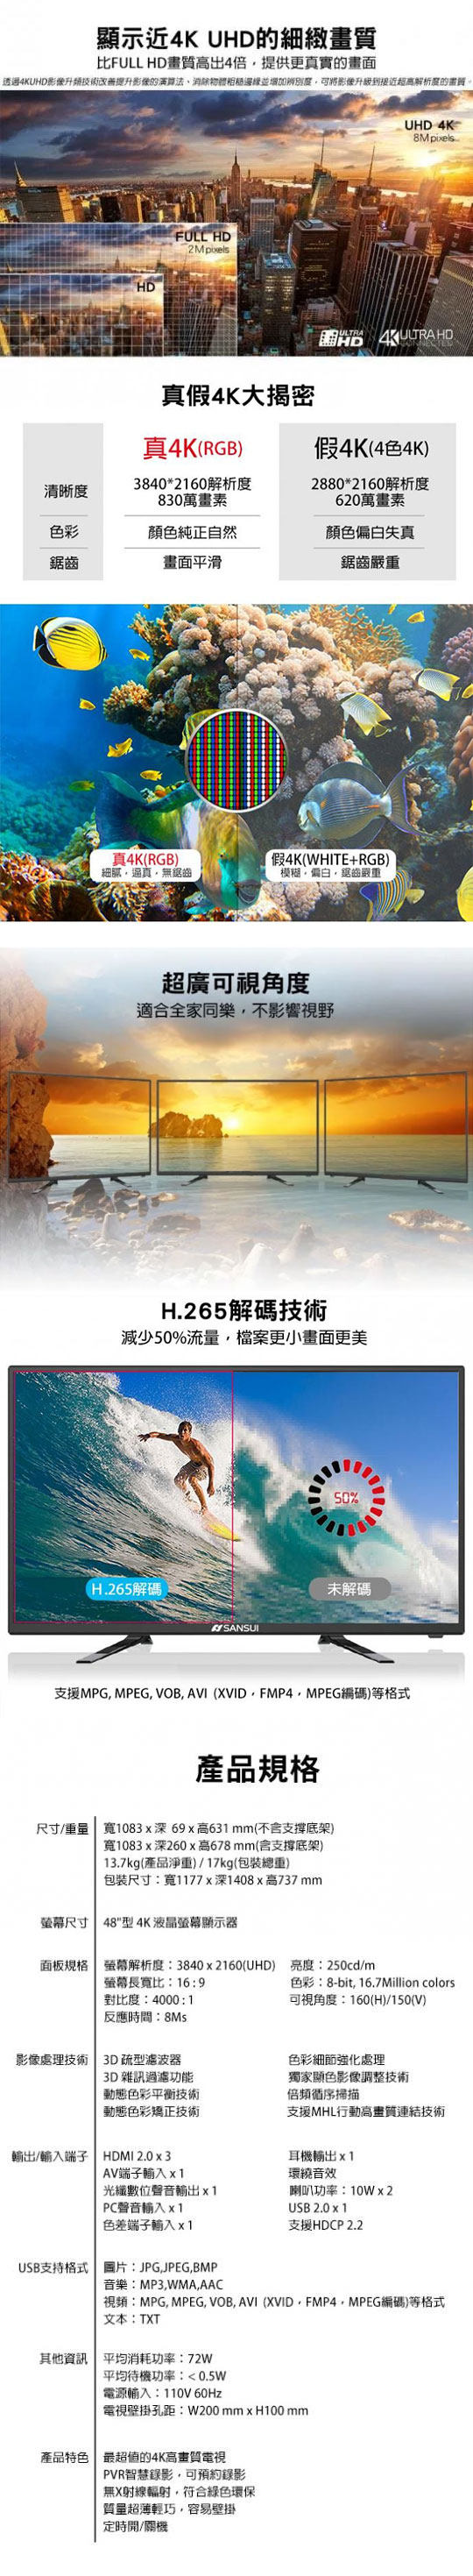 48吋4K液晶電視出租